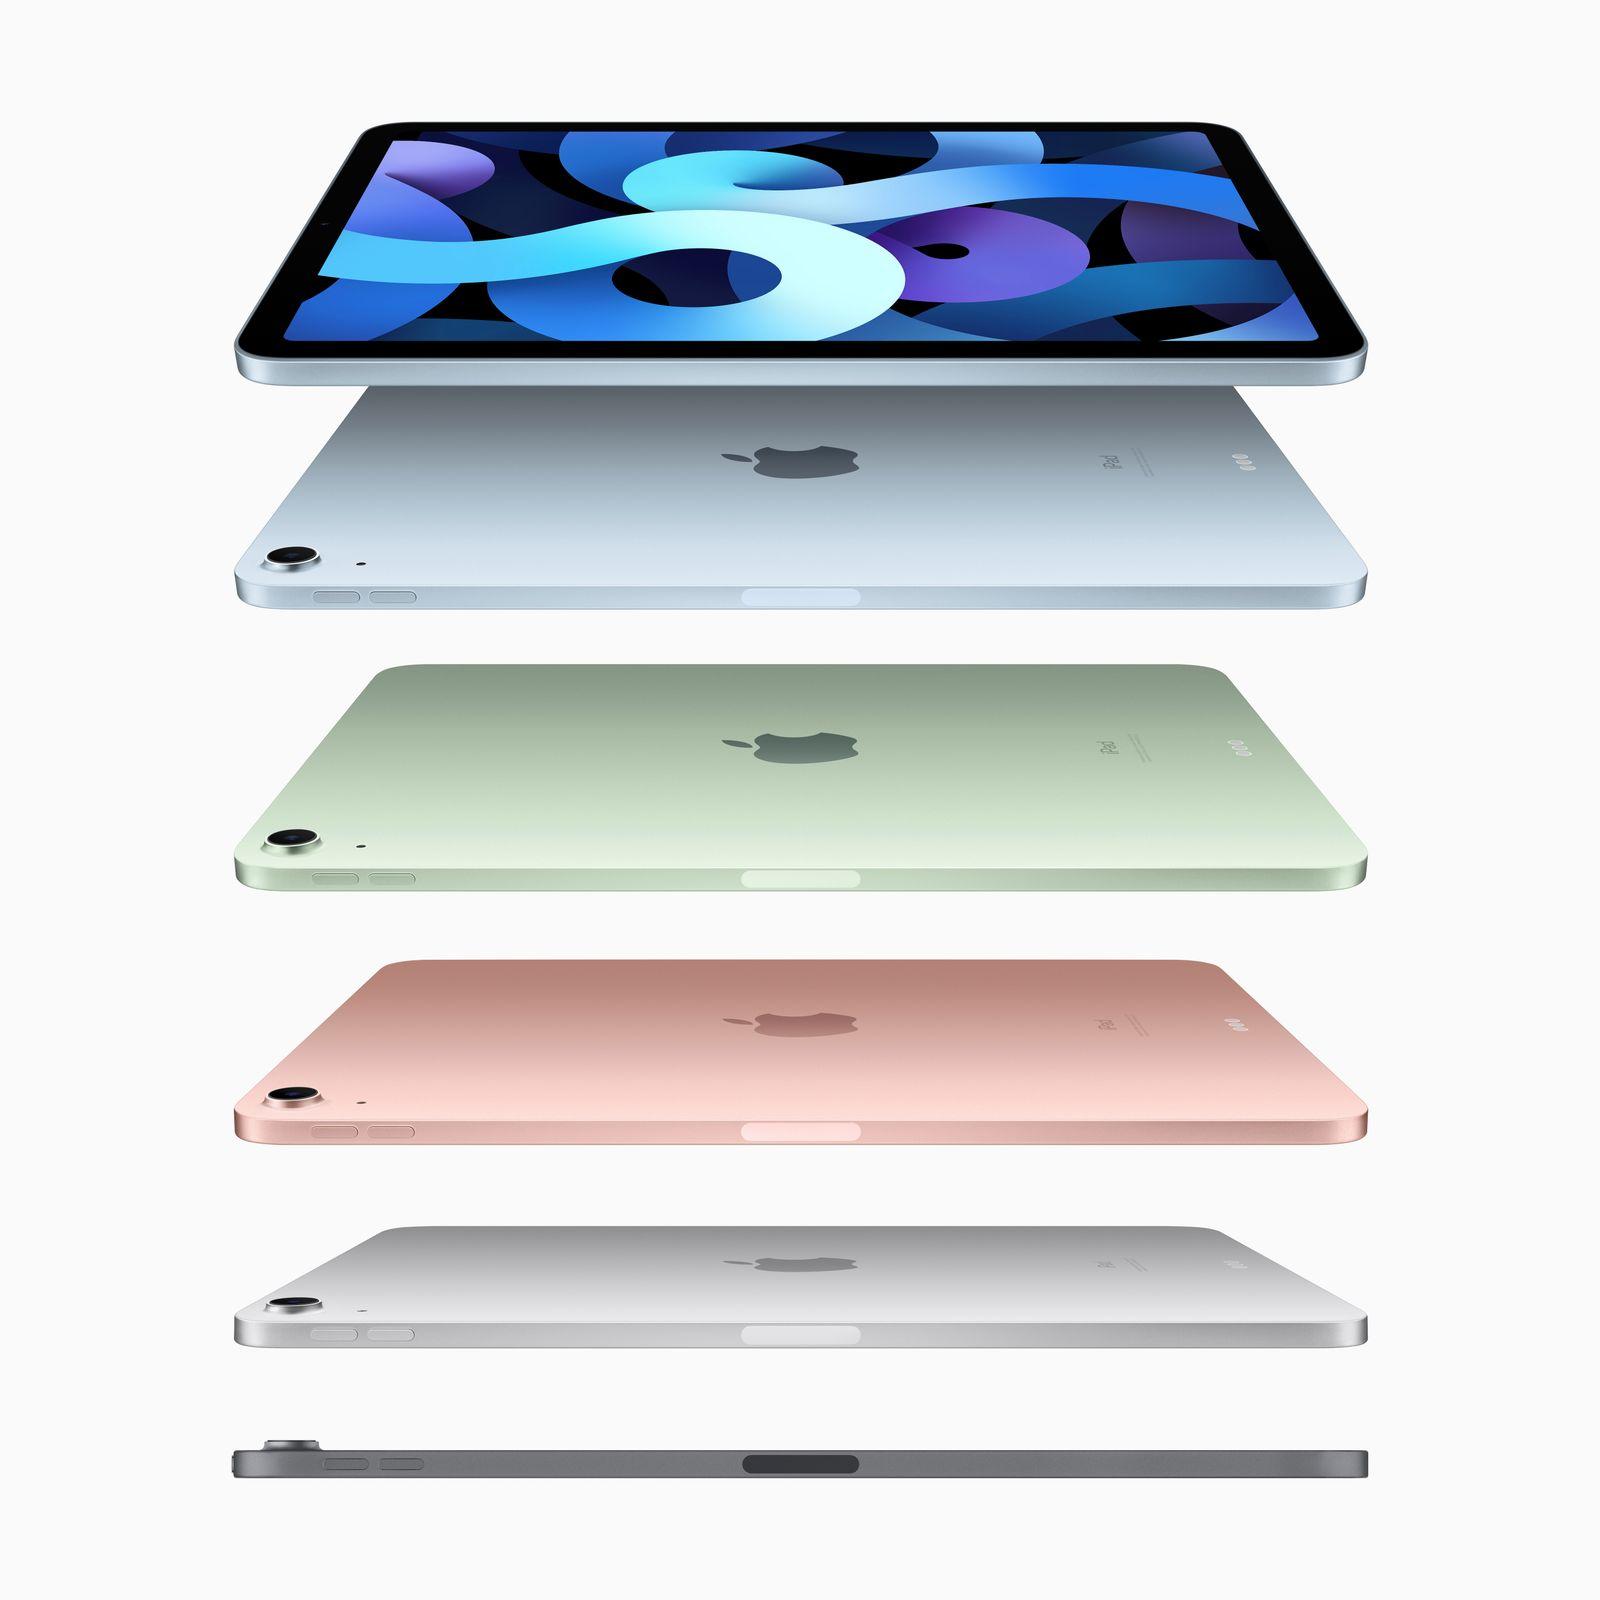 Apple Event, Cupertino, USA - 15 Sep 2020